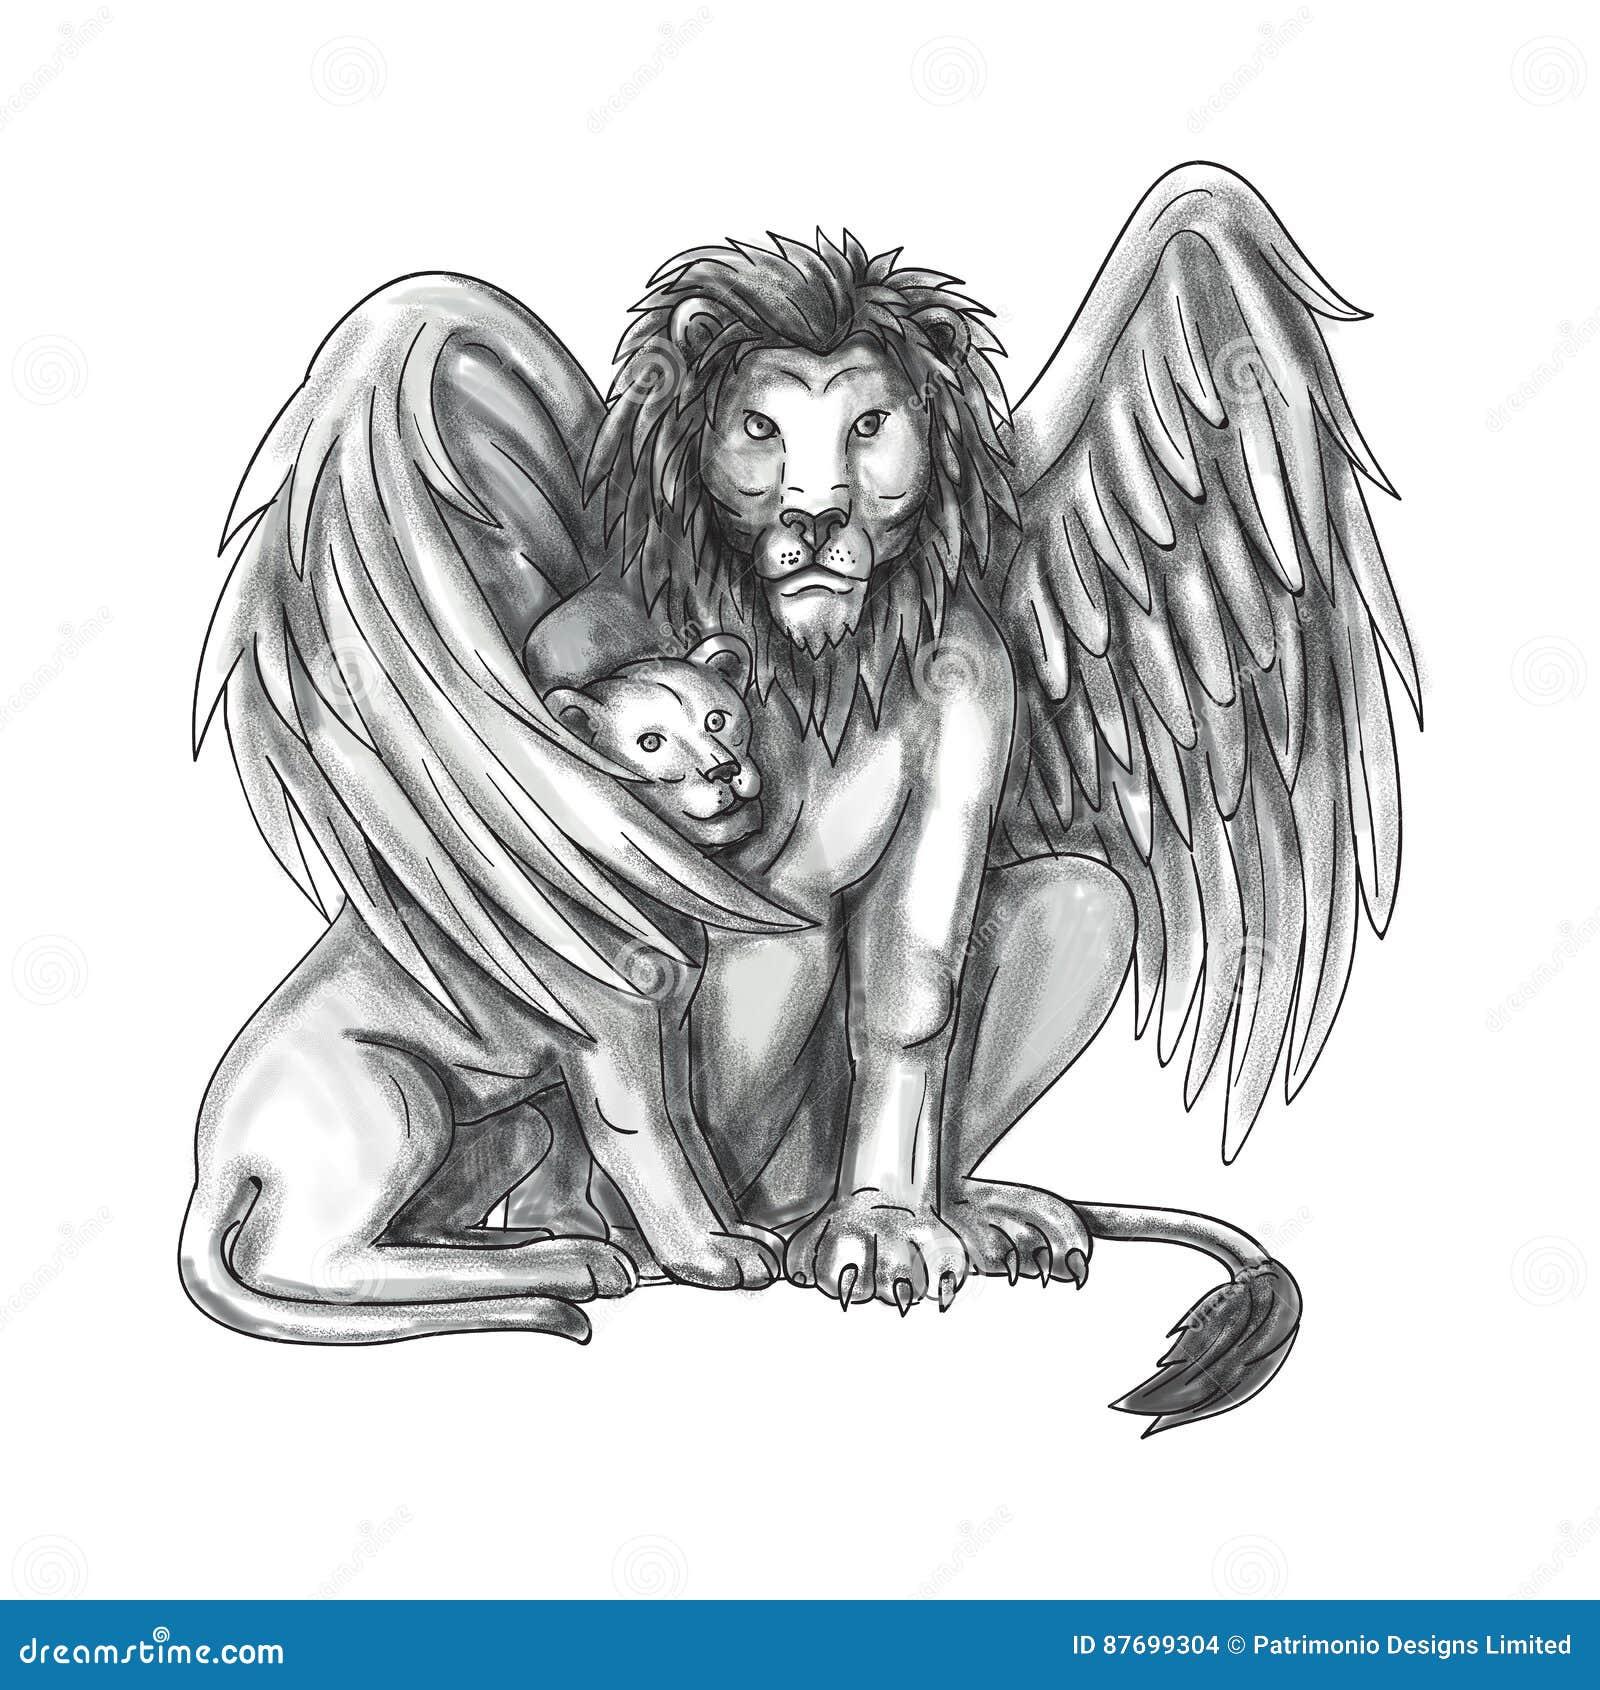 Winged lion tattoo - photo#27